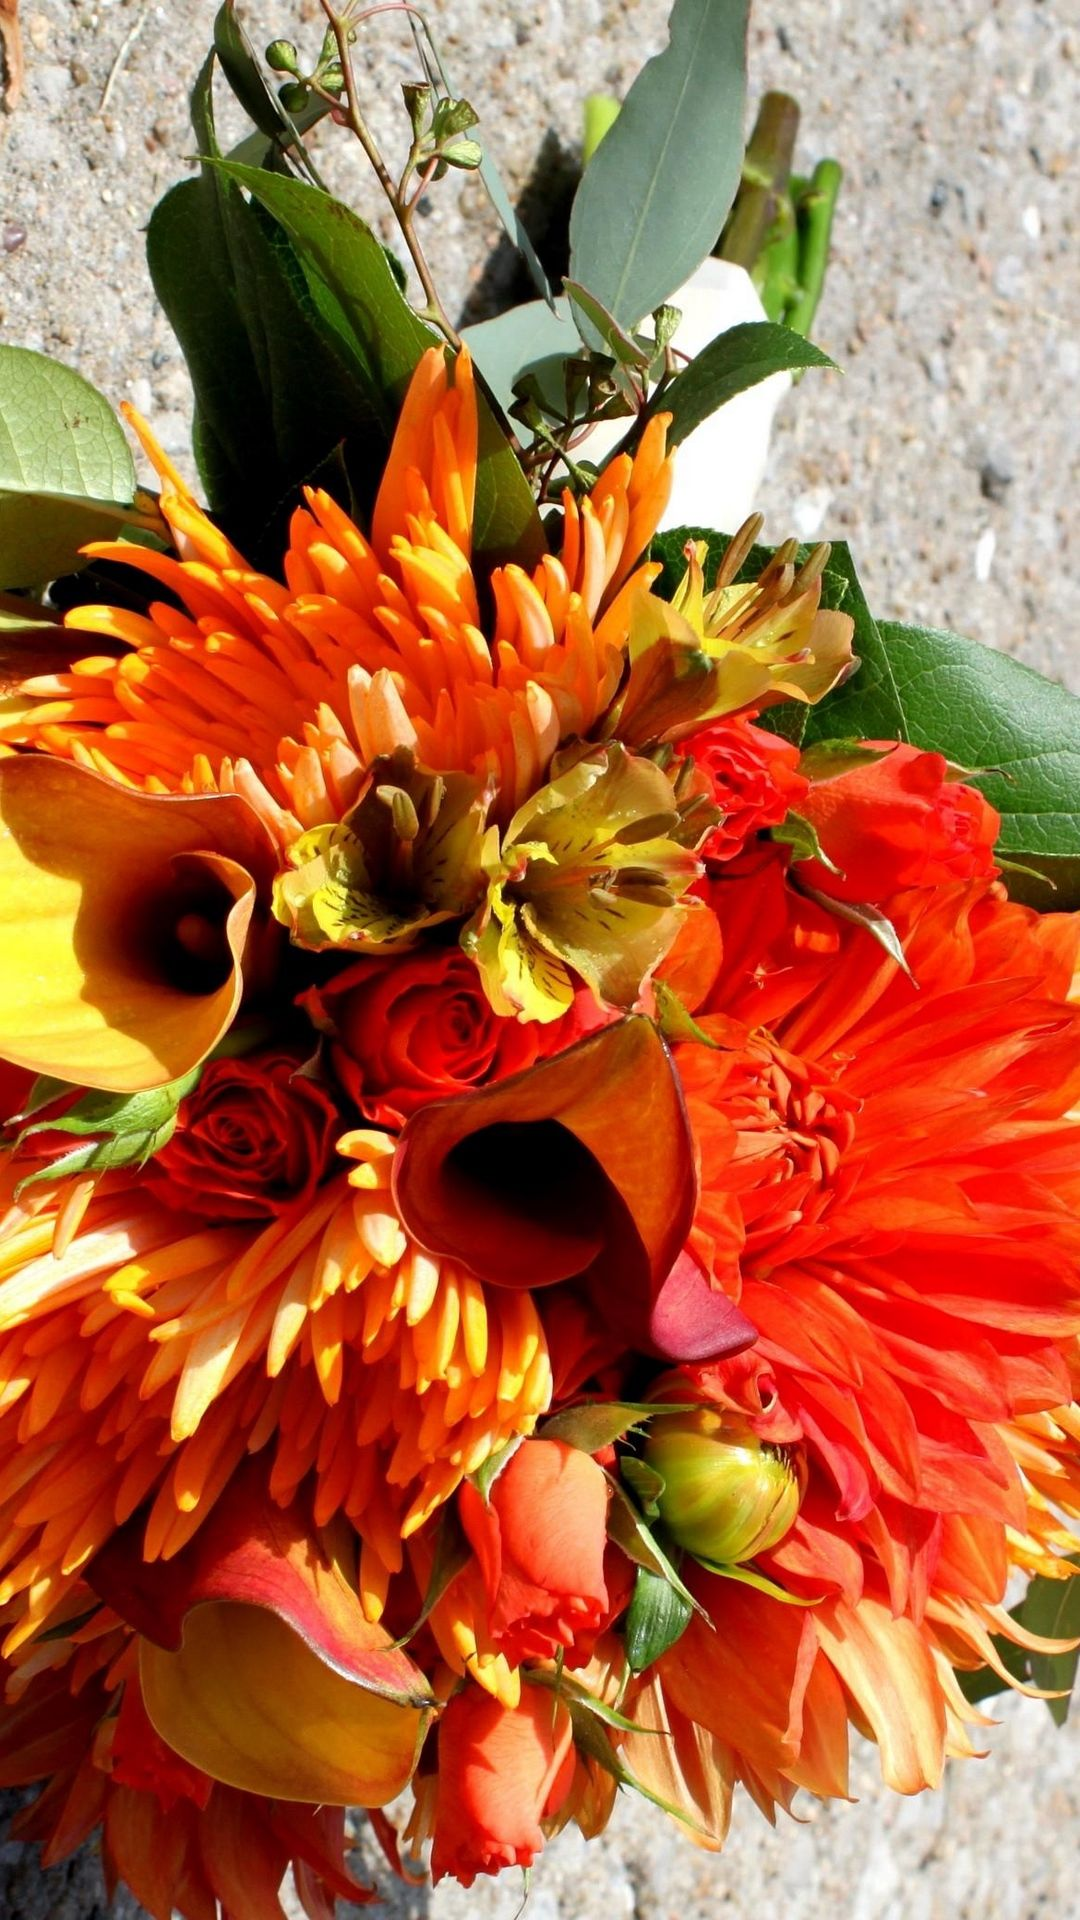 X Wallpaper Calla Lilies, Roses, Alstroemeria, Chrysanthemum, Color